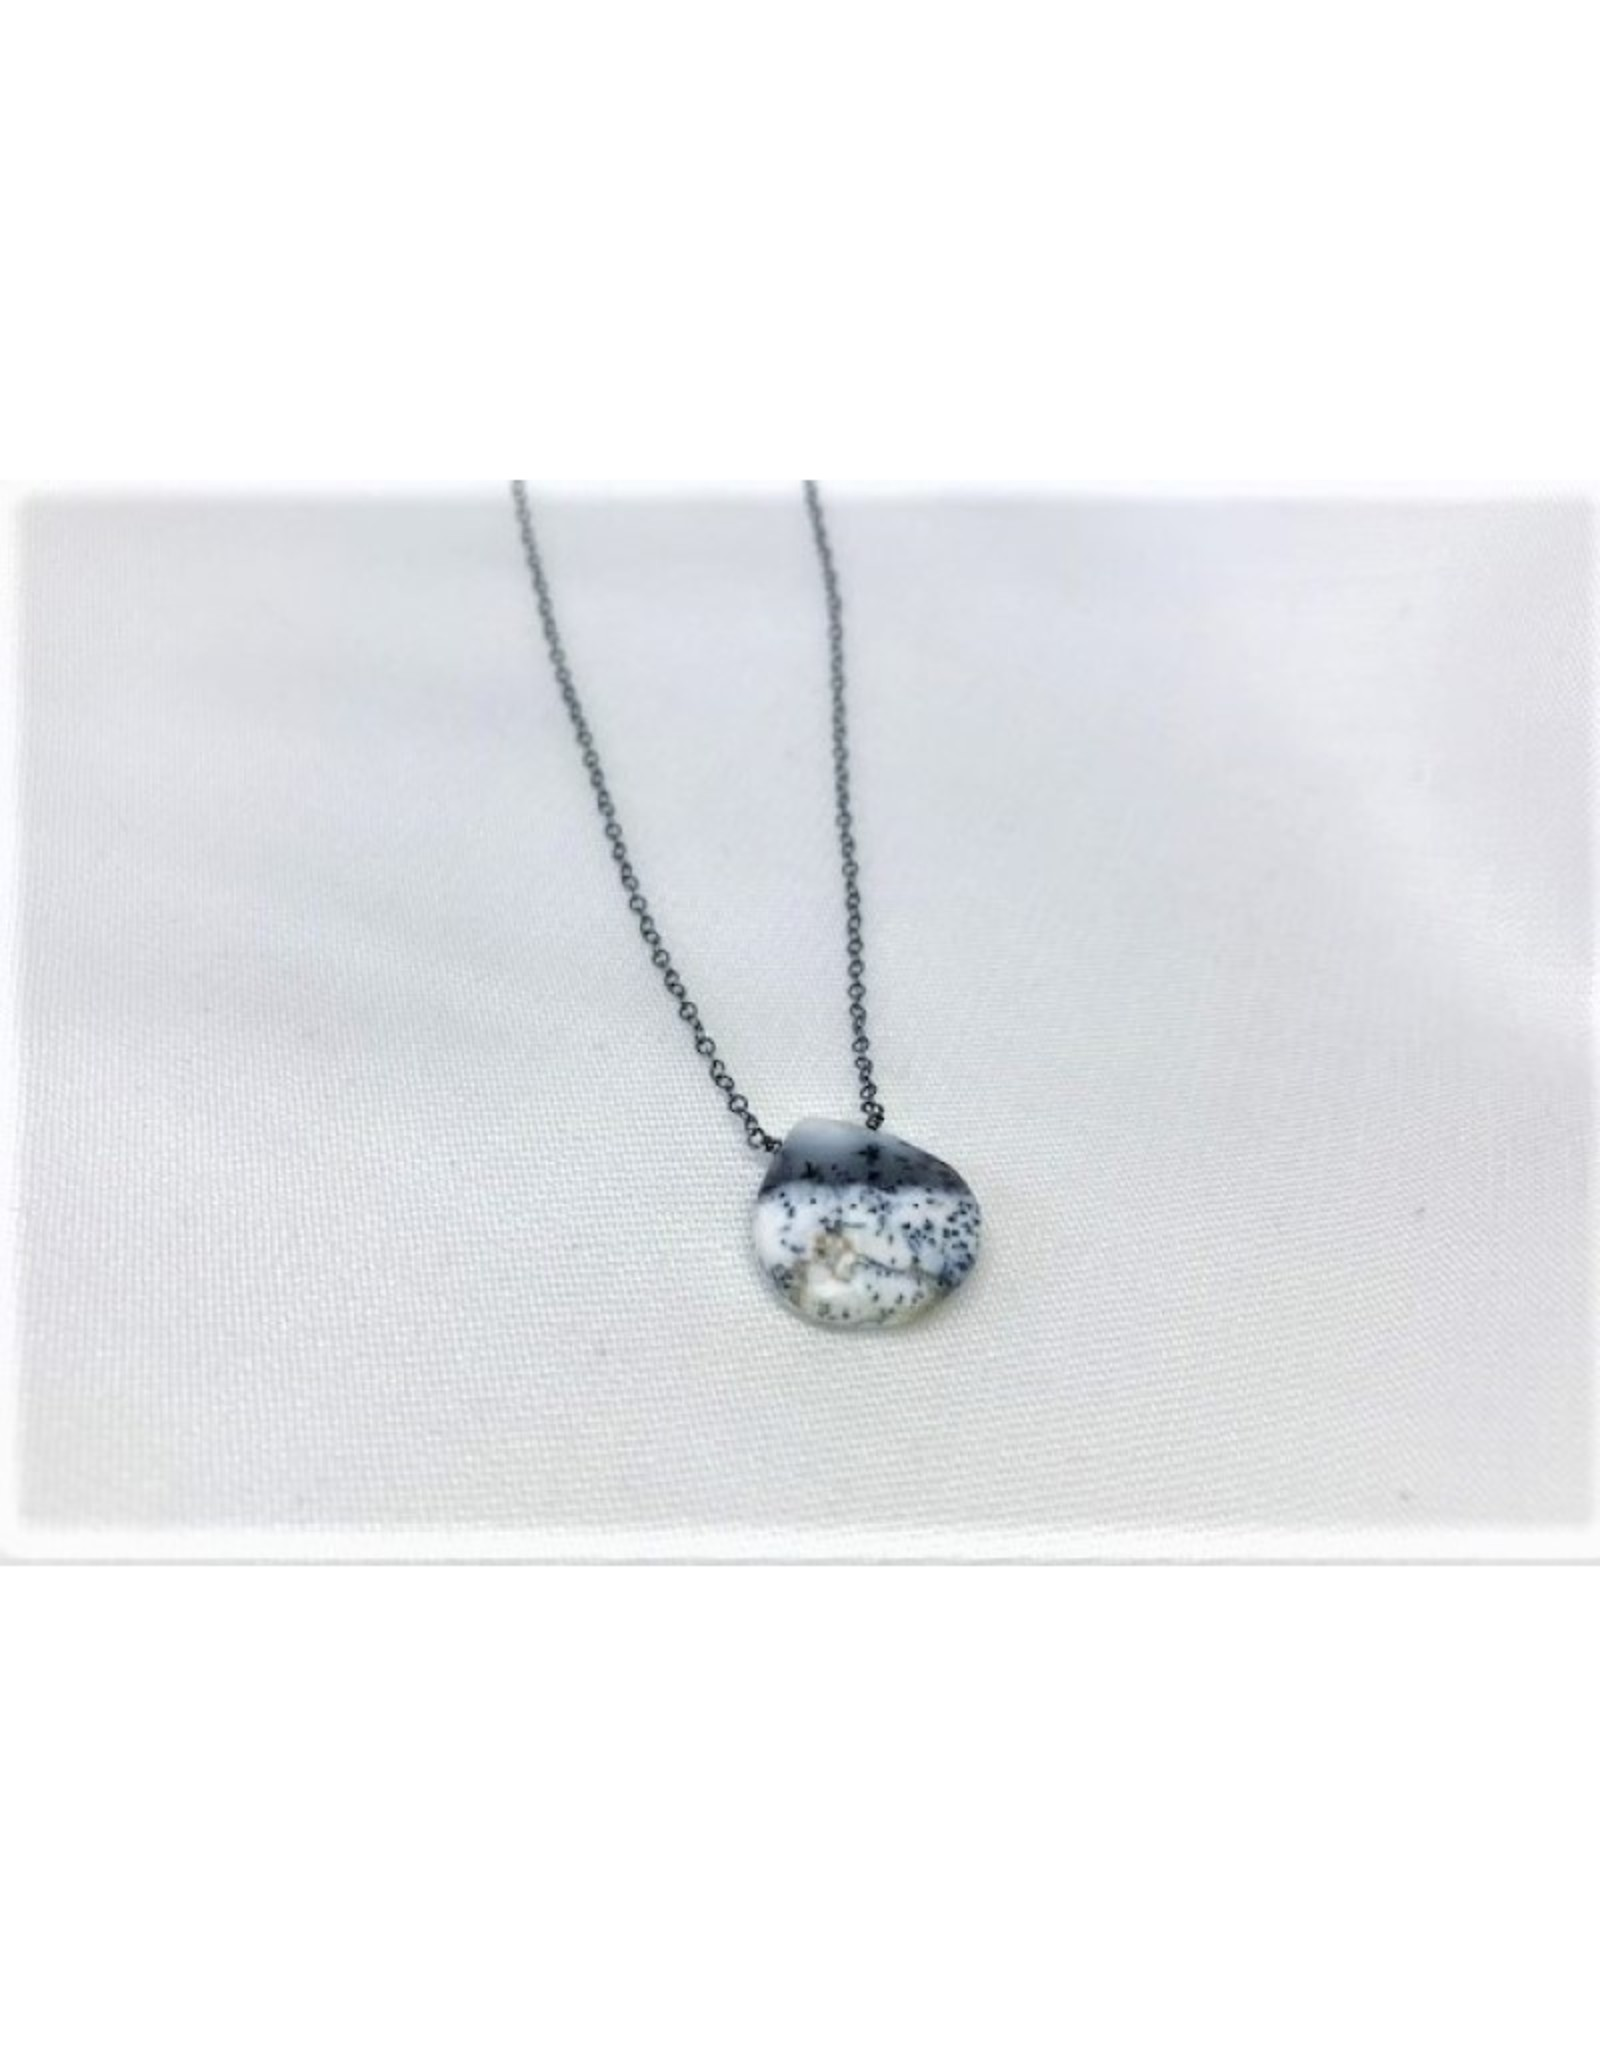 Raw Gemstone Necklace - Dendritic Opal